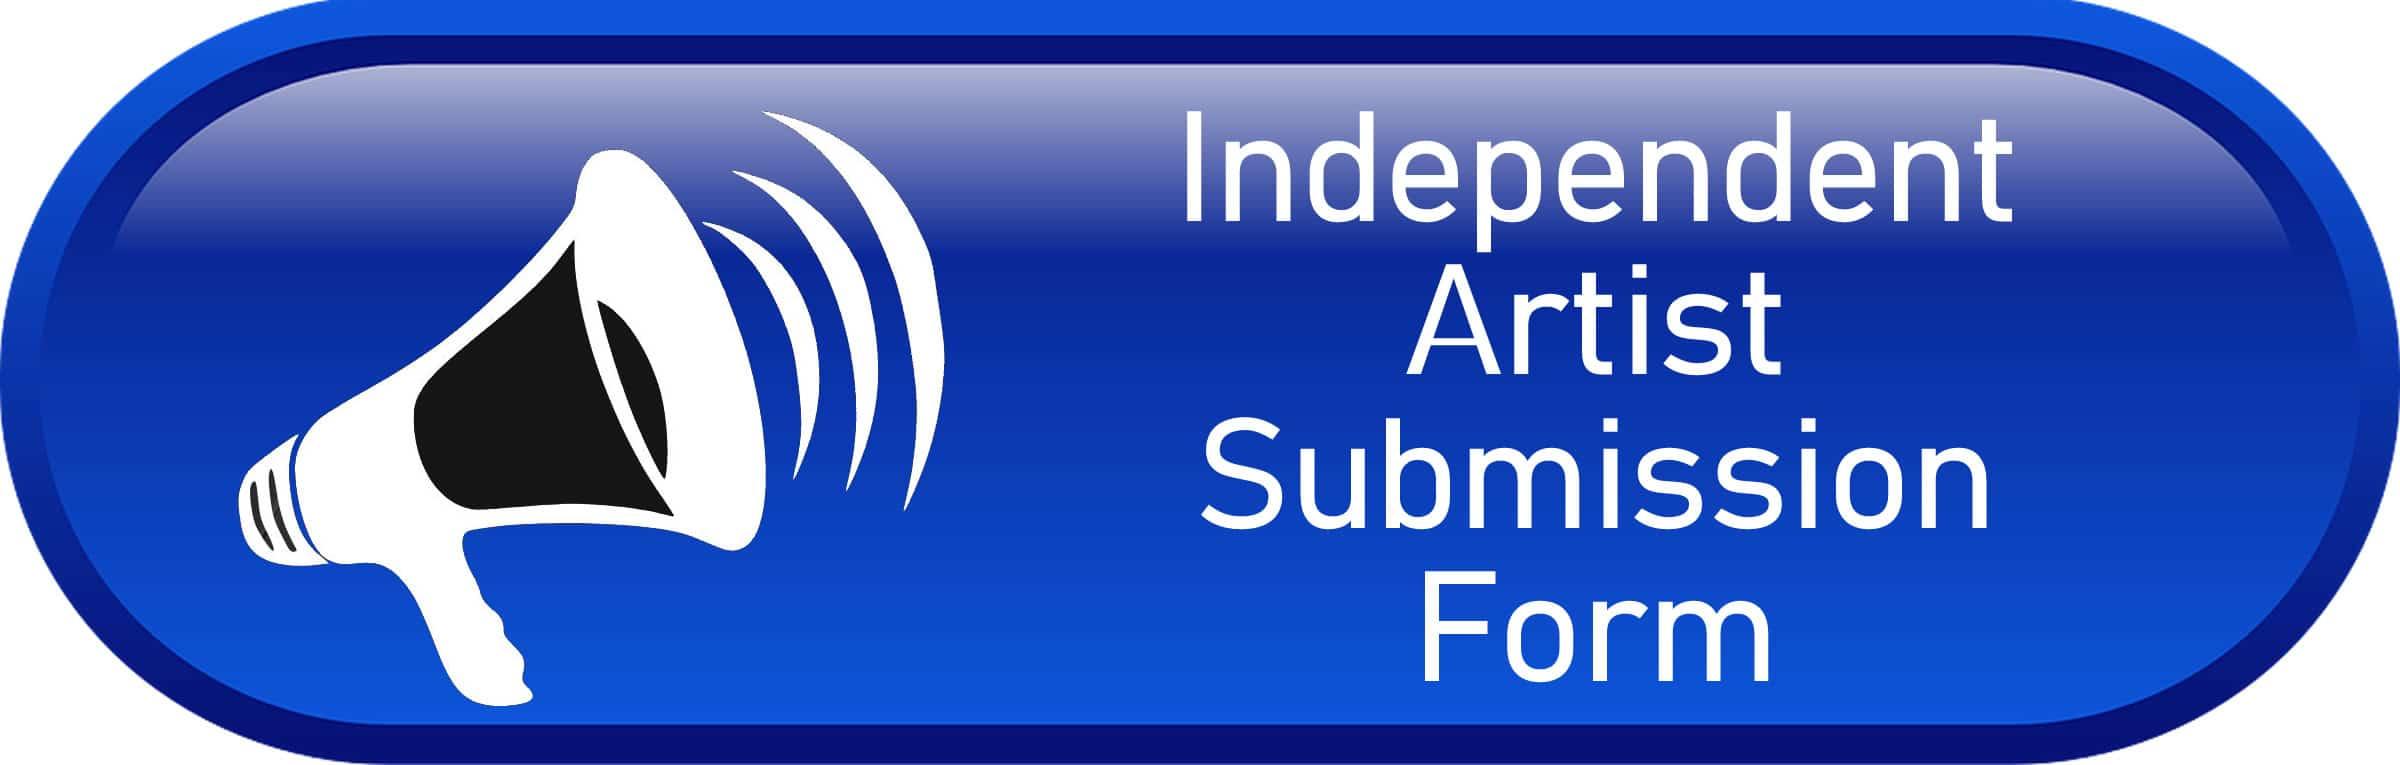 Independent Artist Submission Form - Pontik Radio